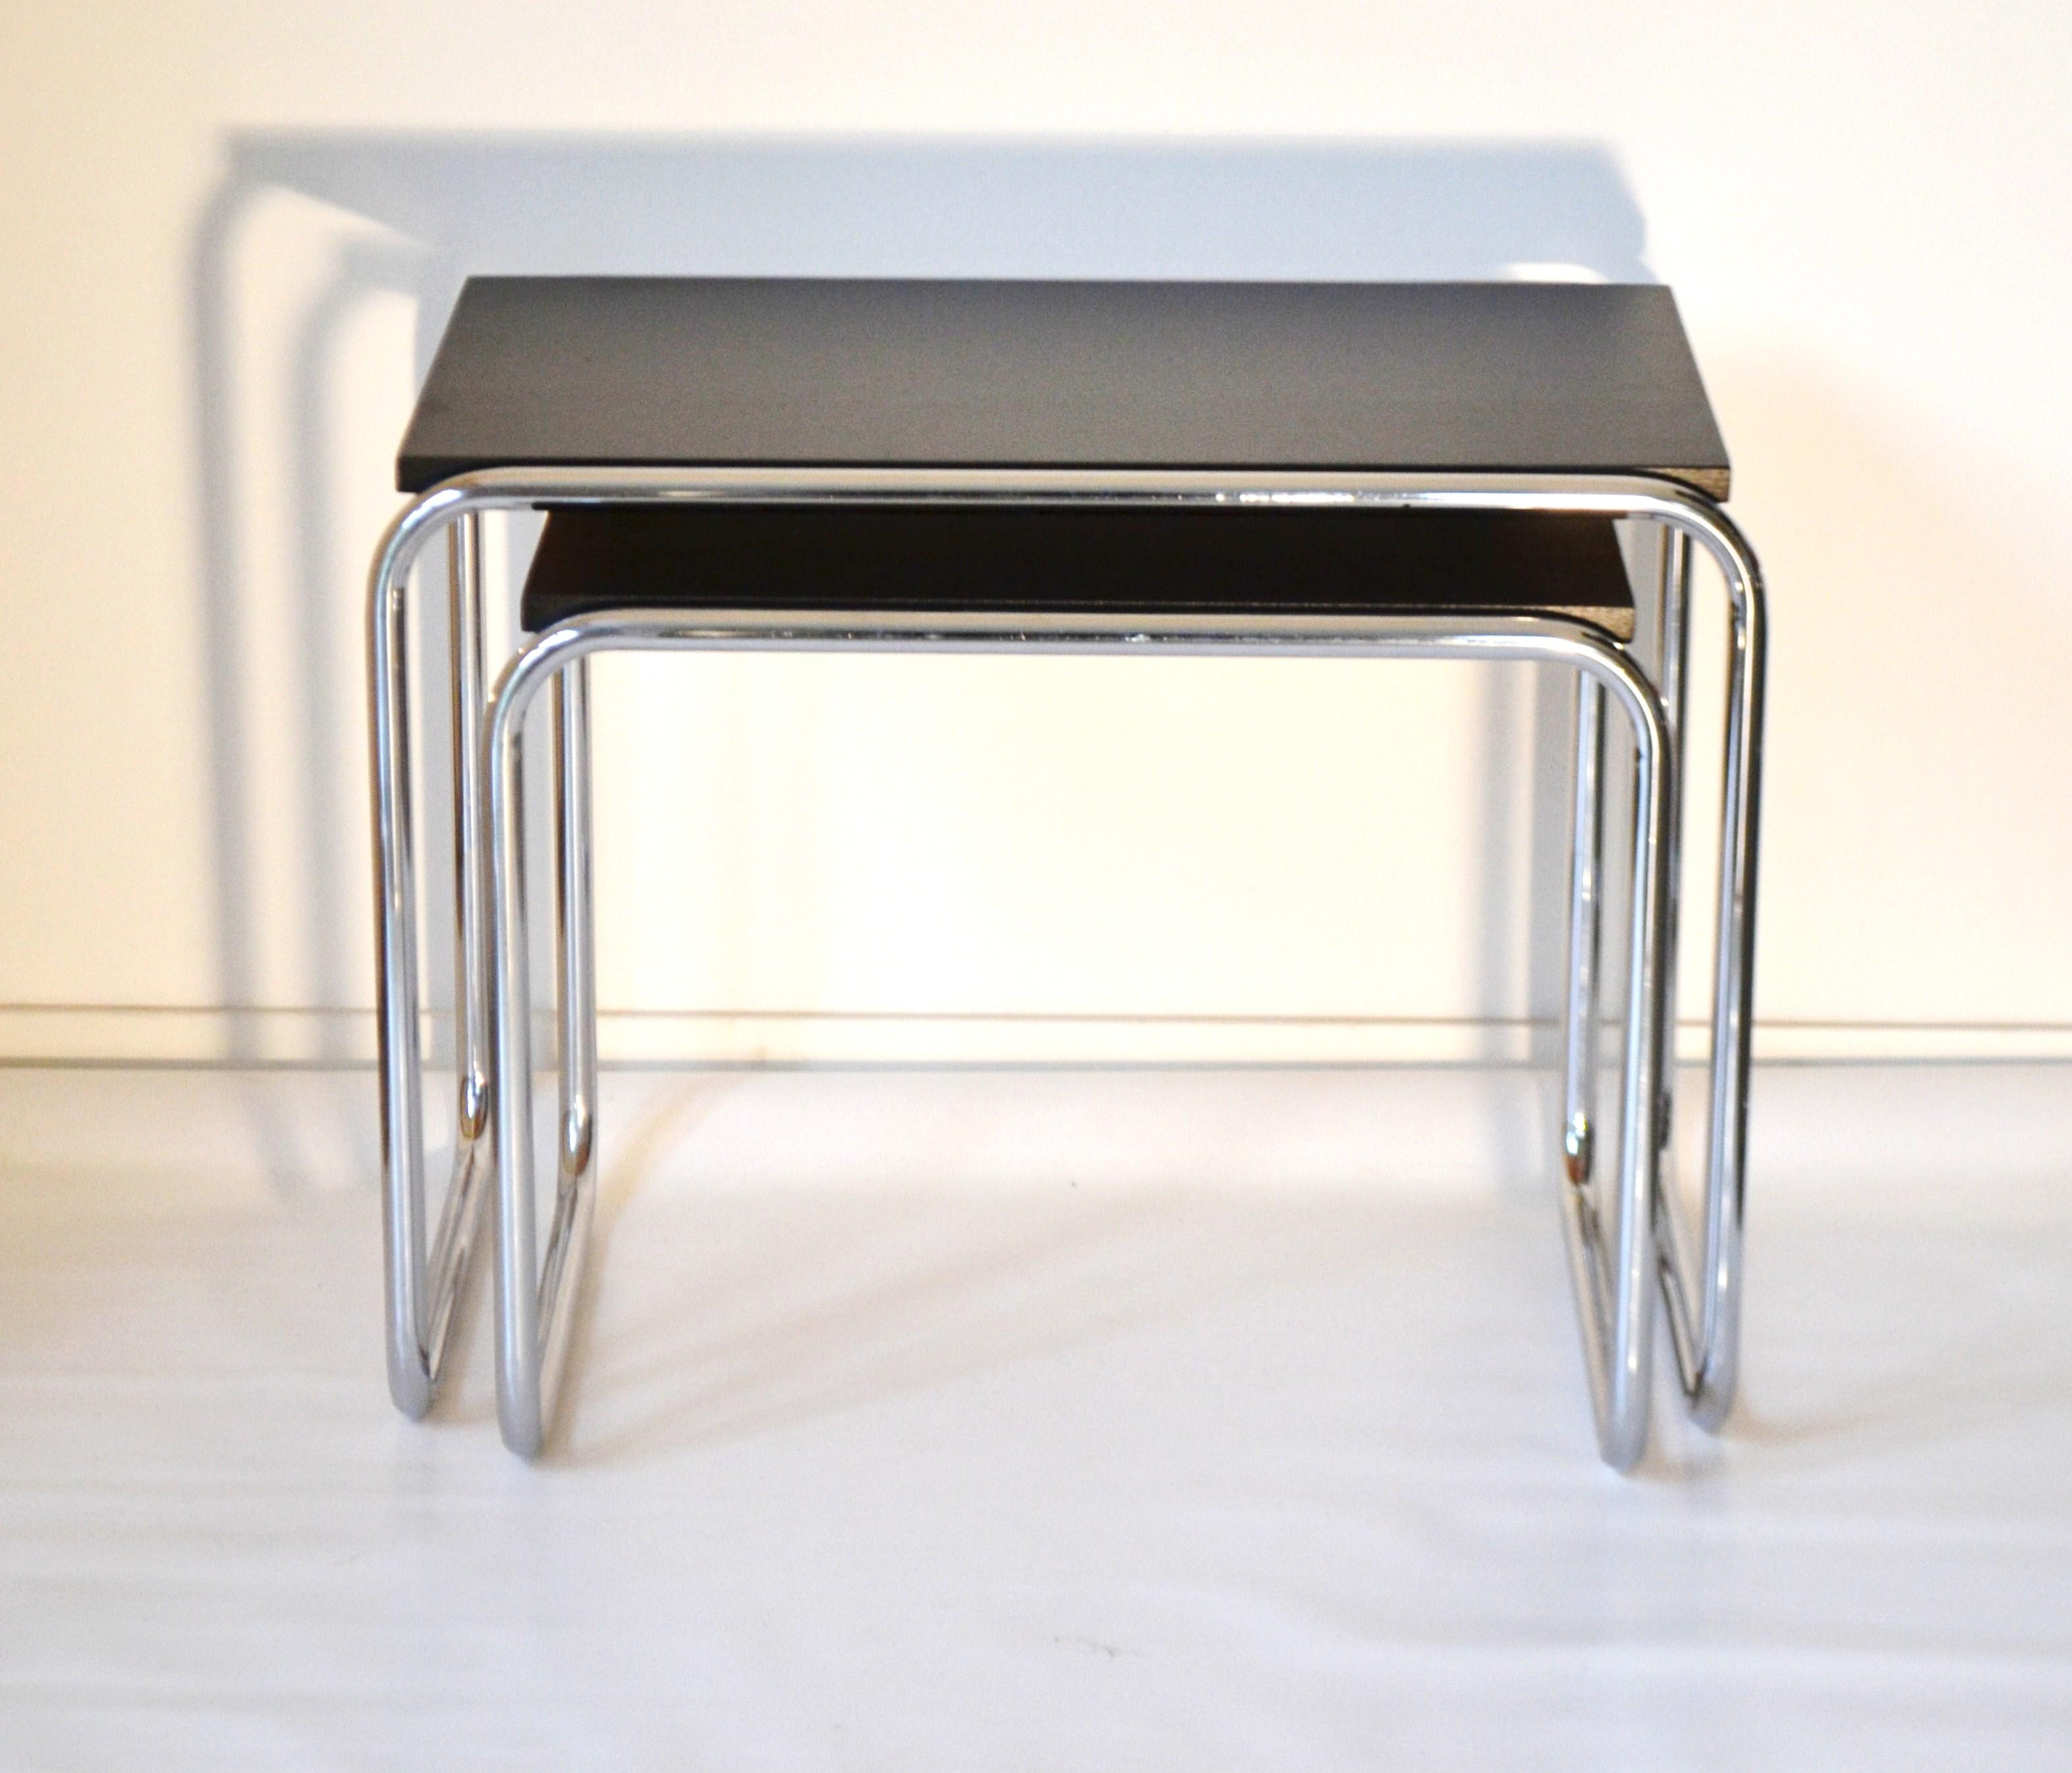 Categories: Tables, Bauhaus Style